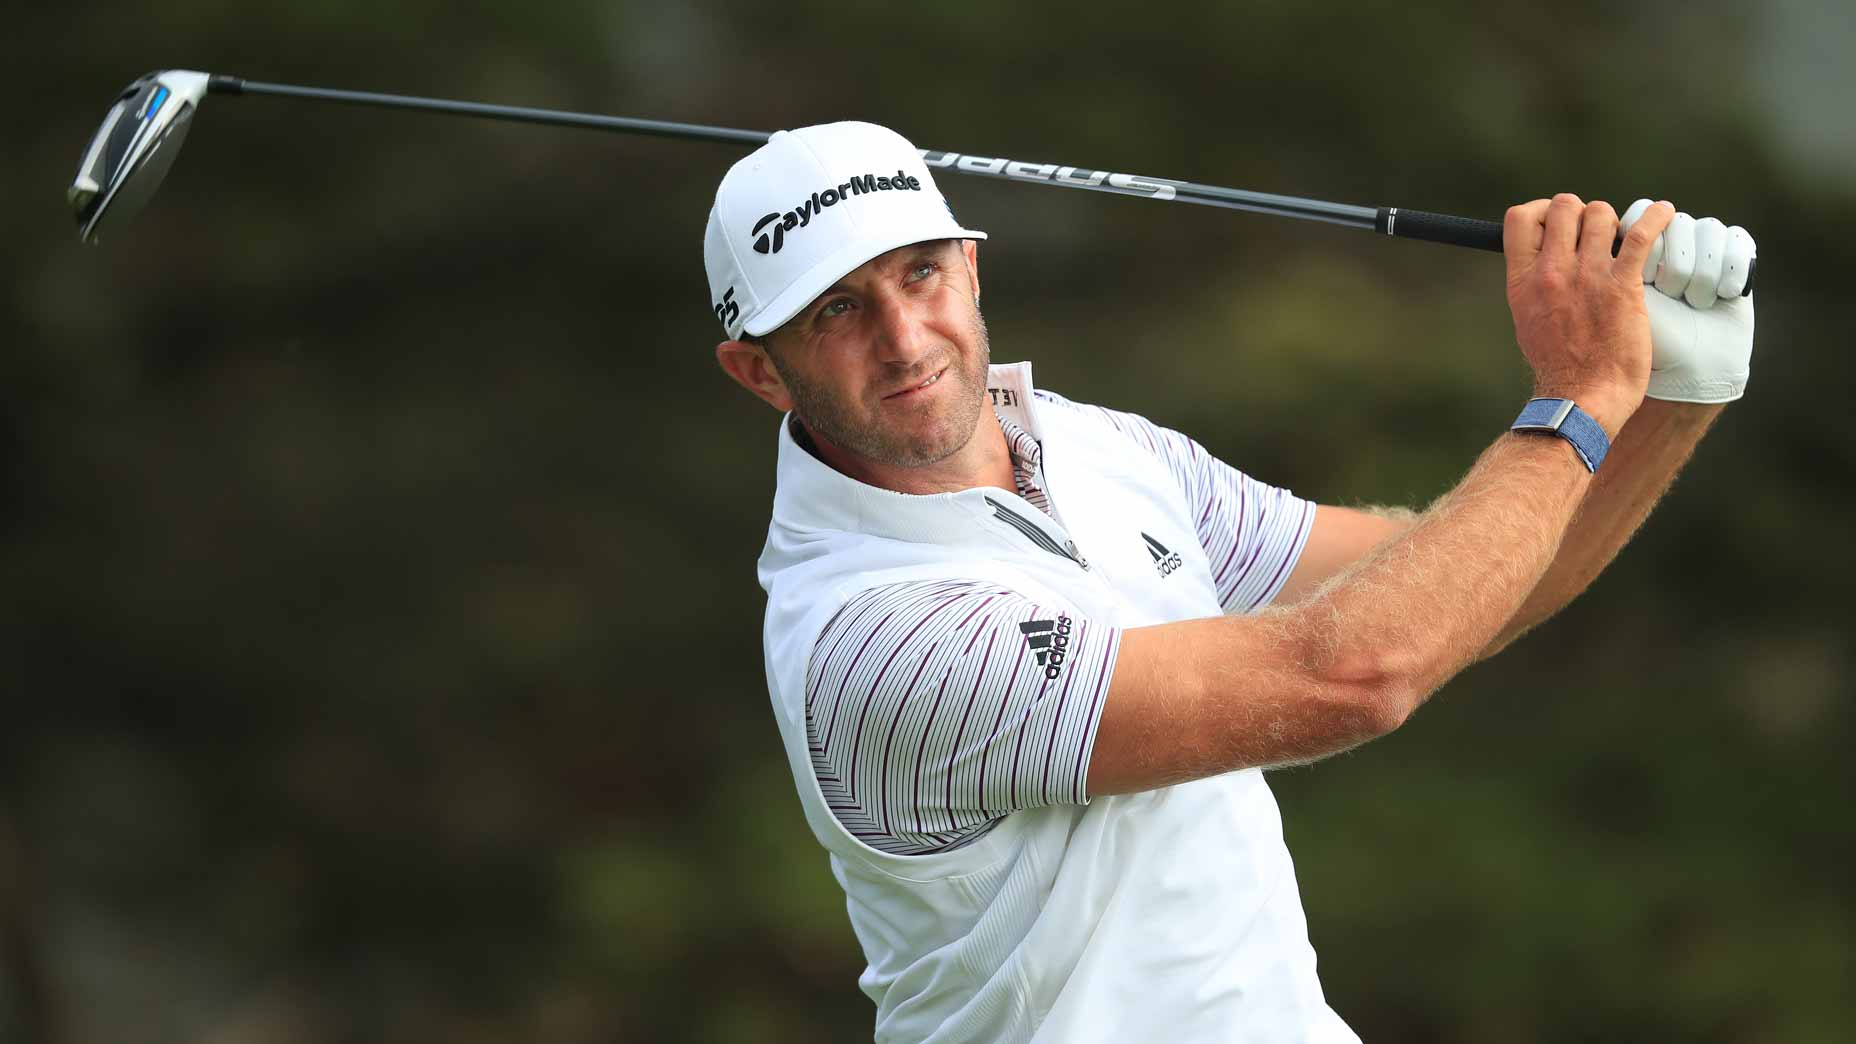 Pro golfer Dustin Johnons at 2020 PGA Championship